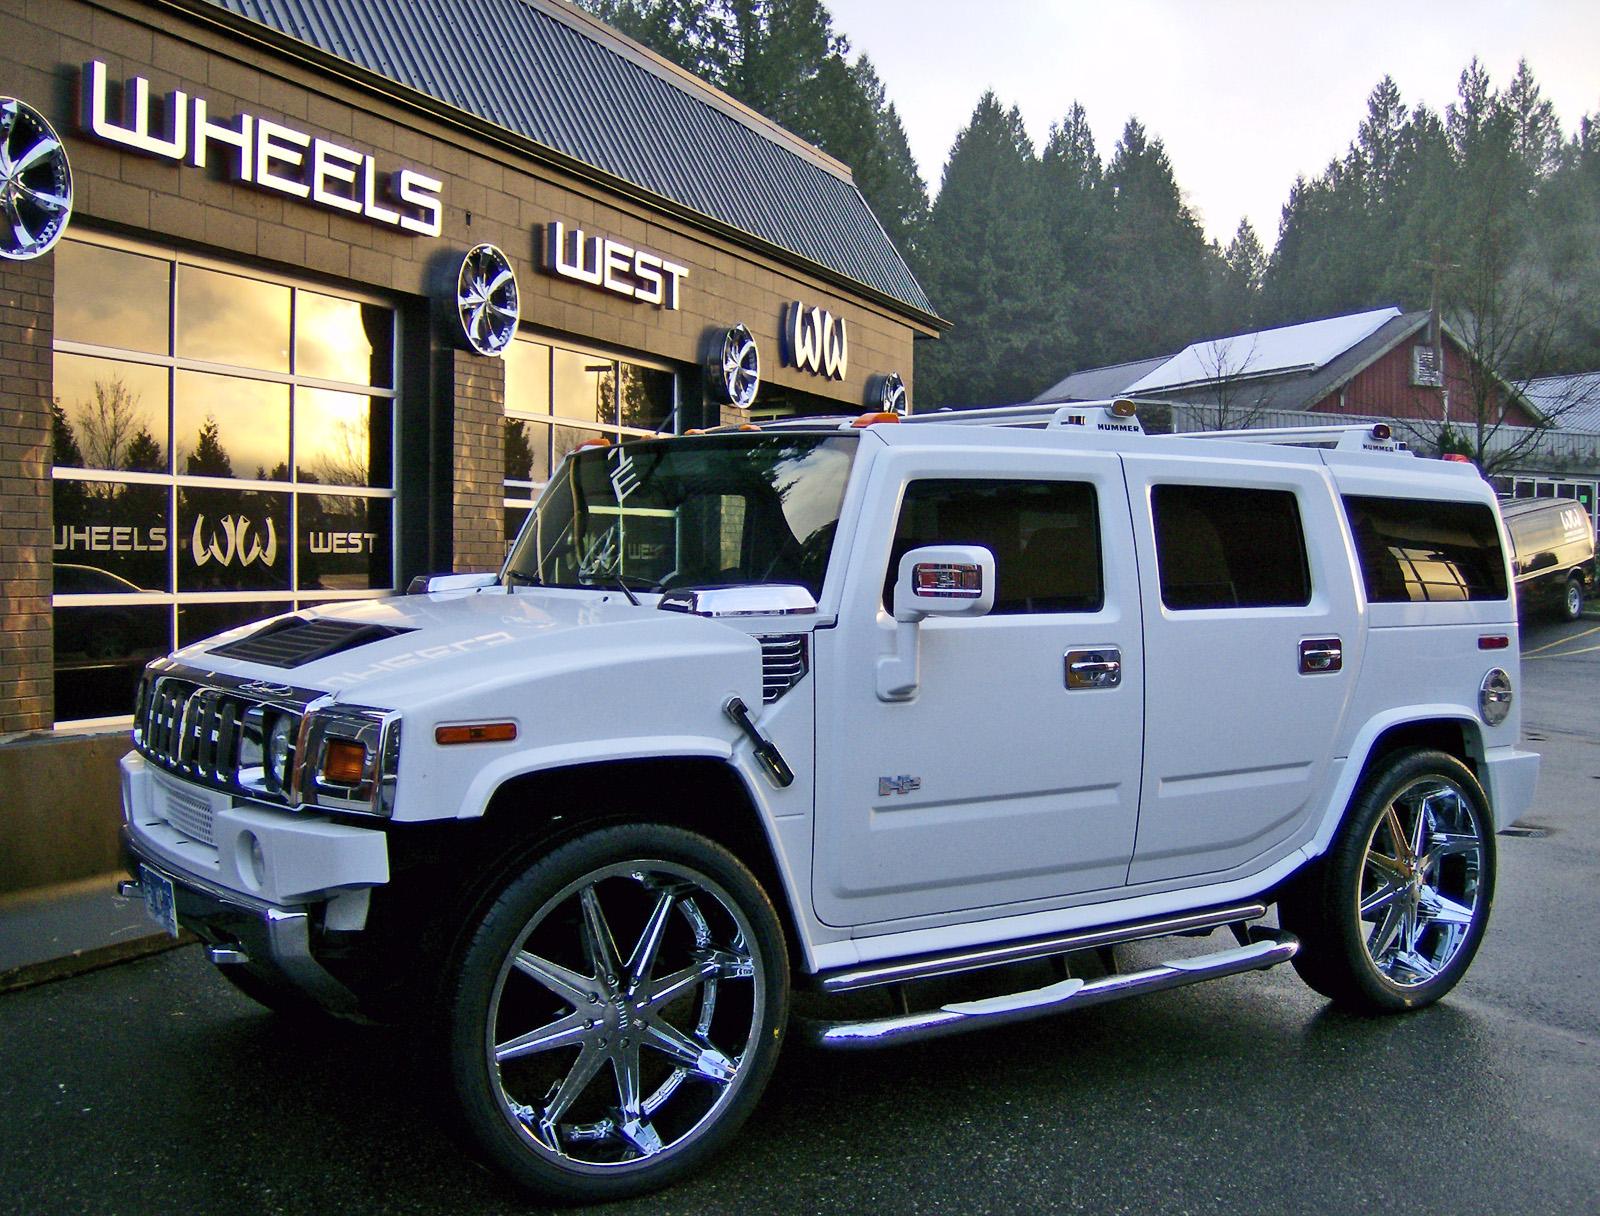 Rims, tires, alloy wheels, 24 inch rims, dub rims, enkei wheels